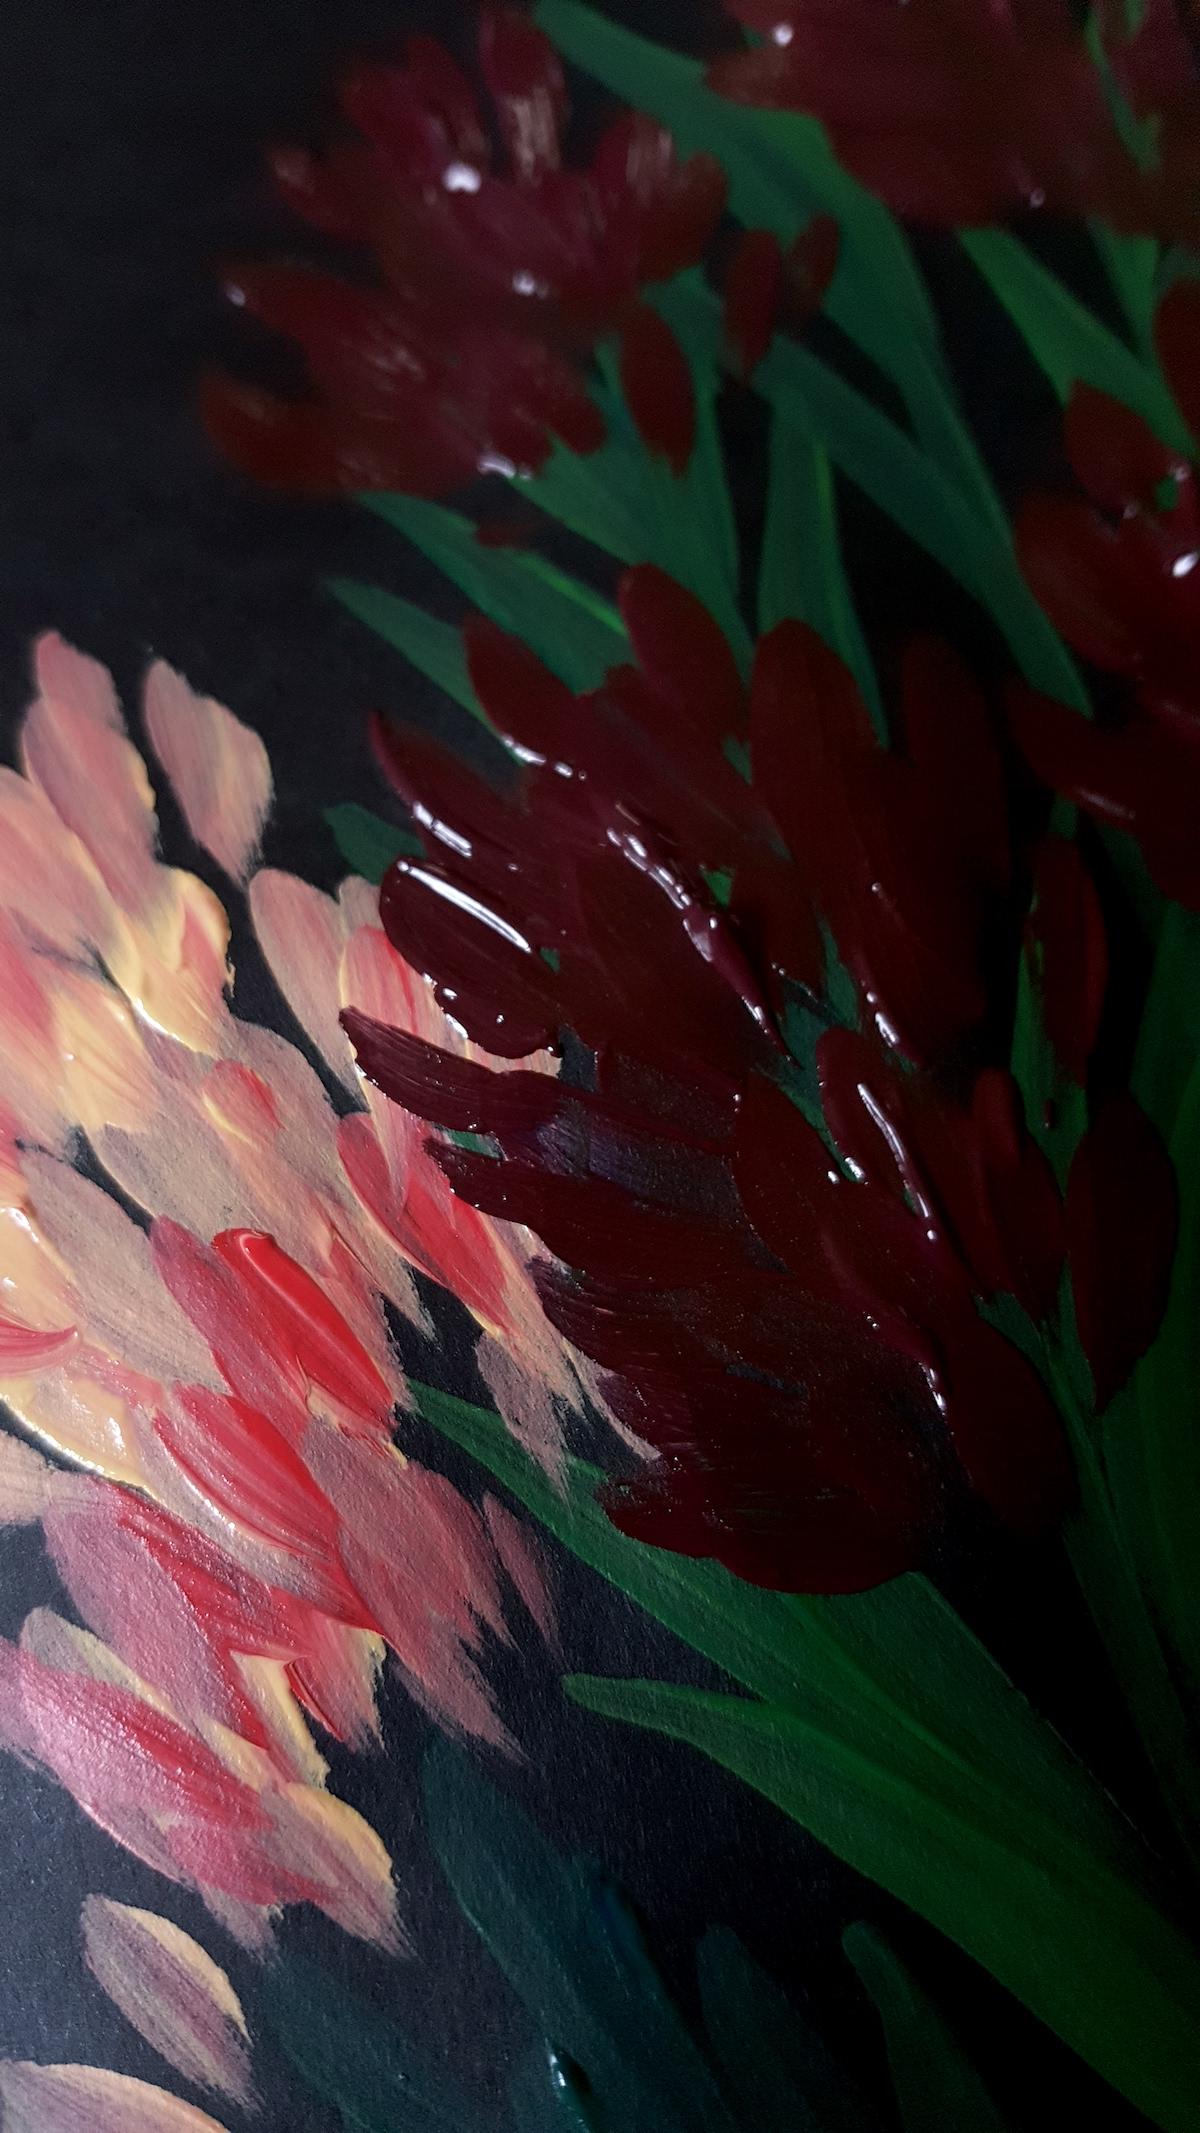 Acrylic Paintings Illustrator inspired by Burne Jones